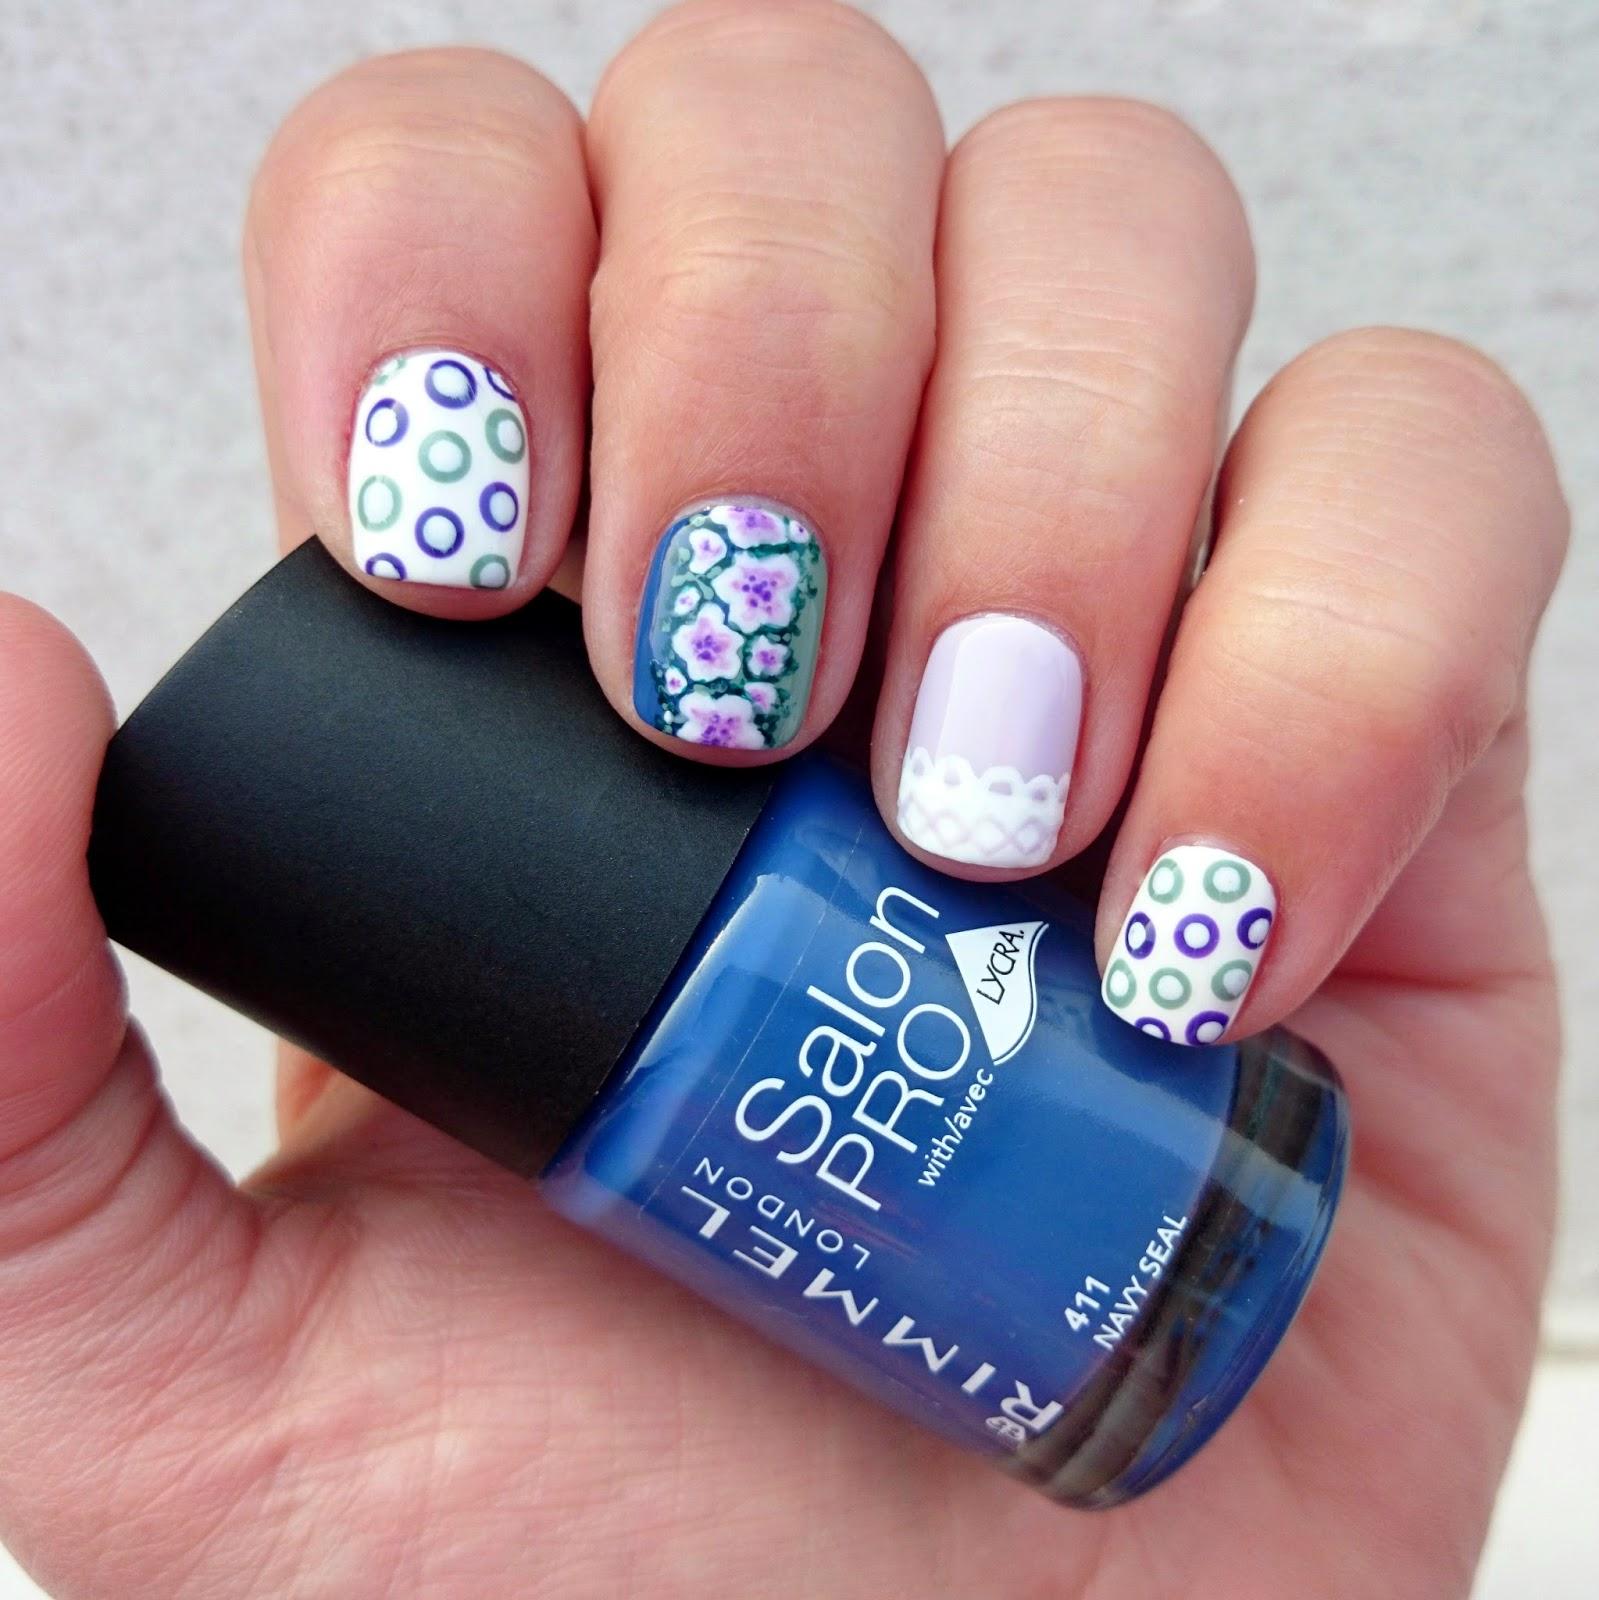 Dahlia Nails: Goddess